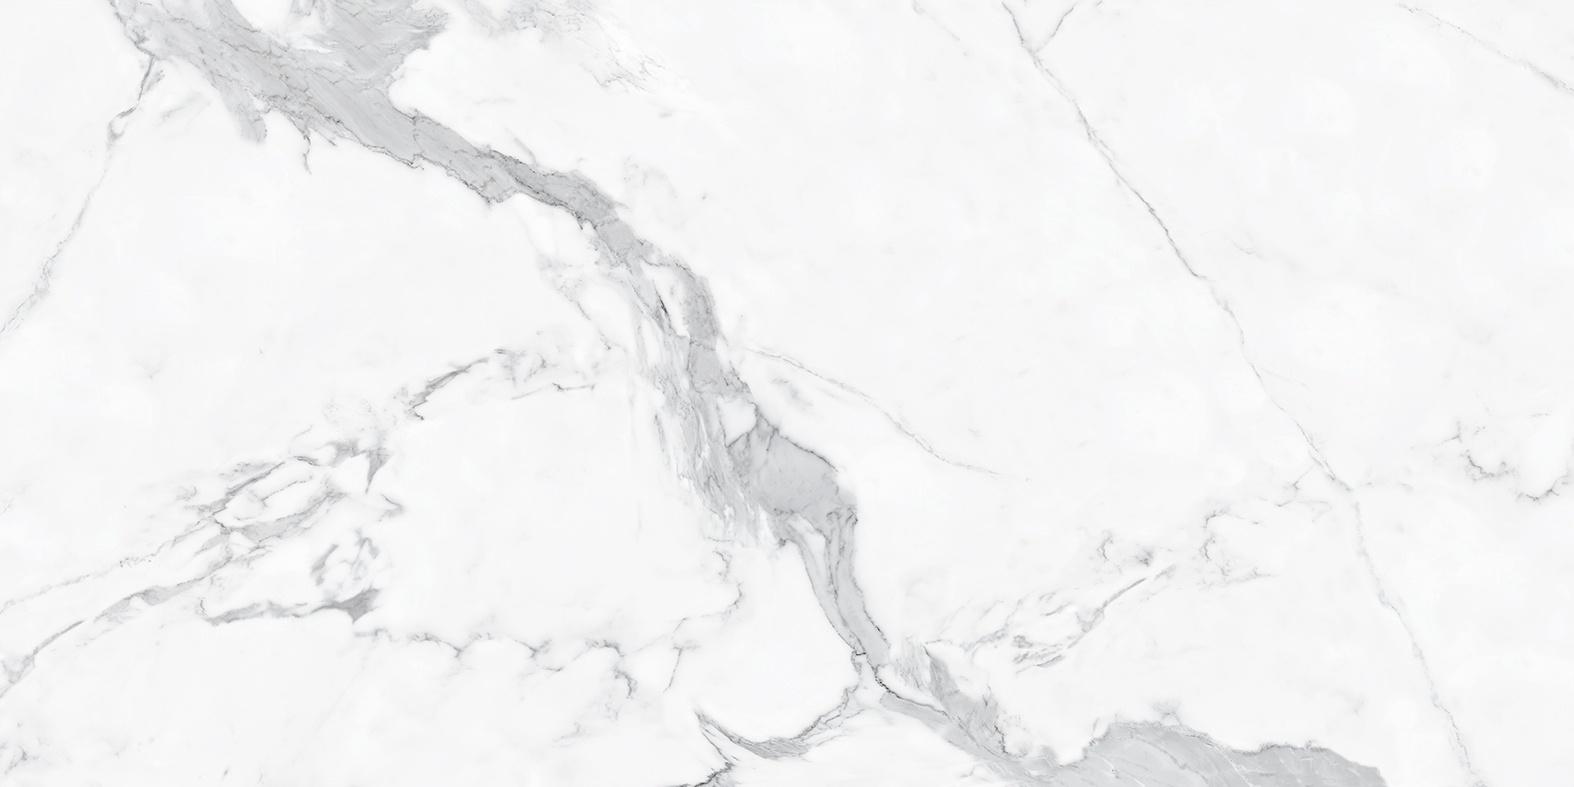 "Thin Porcelain 12"" x 24"" Polished White Porcelain Field Backsplash Wall & Floor Tile"